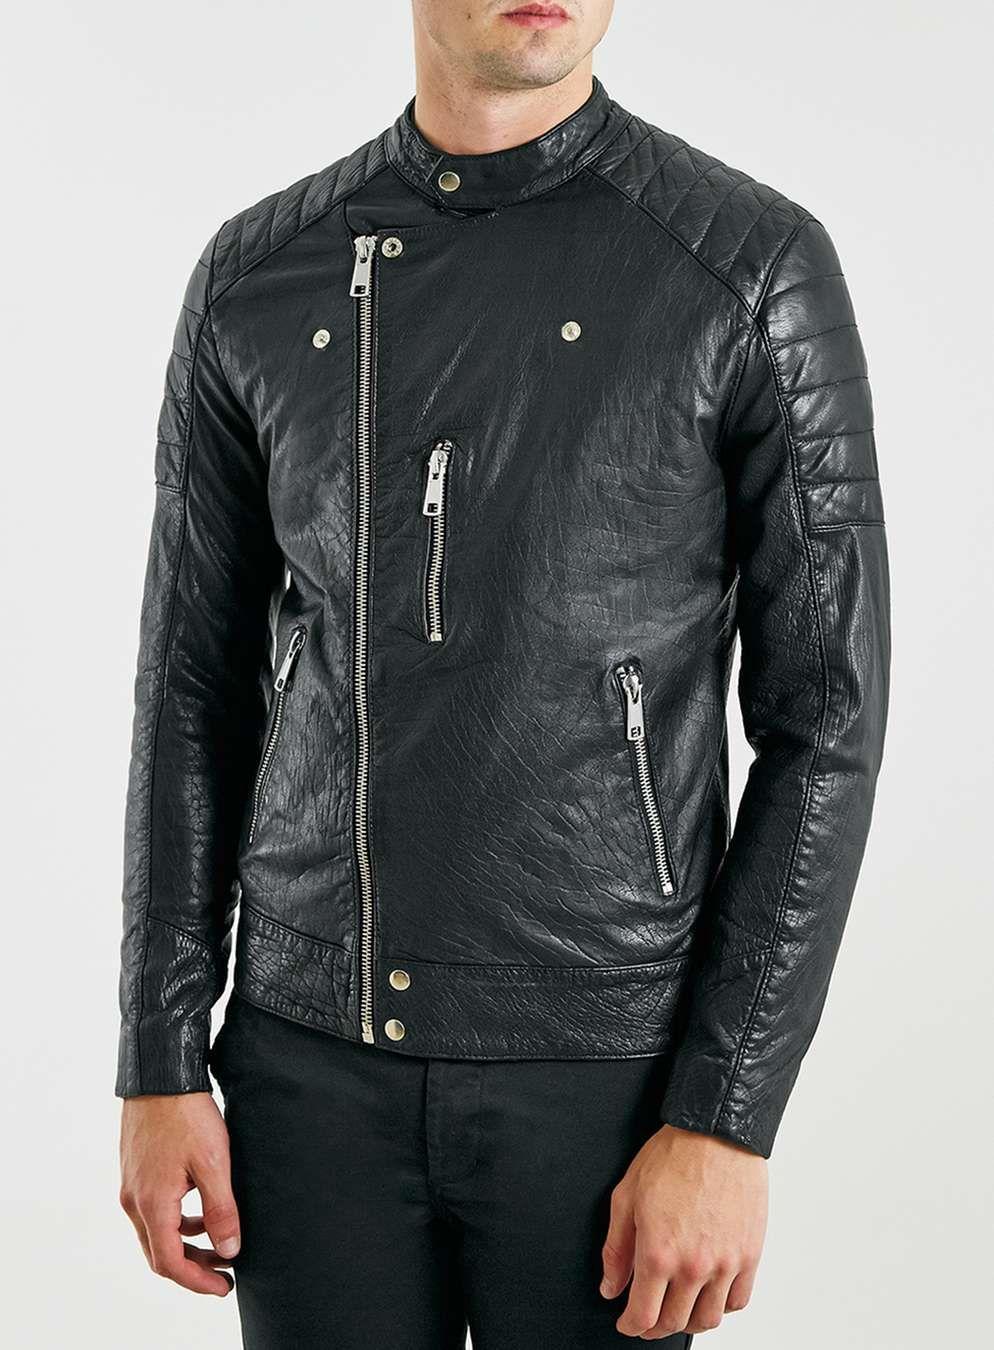 Black Collarless Leather Biker Jacket Moda Hombre Moda Hombres [ 1350 x 994 Pixel ]